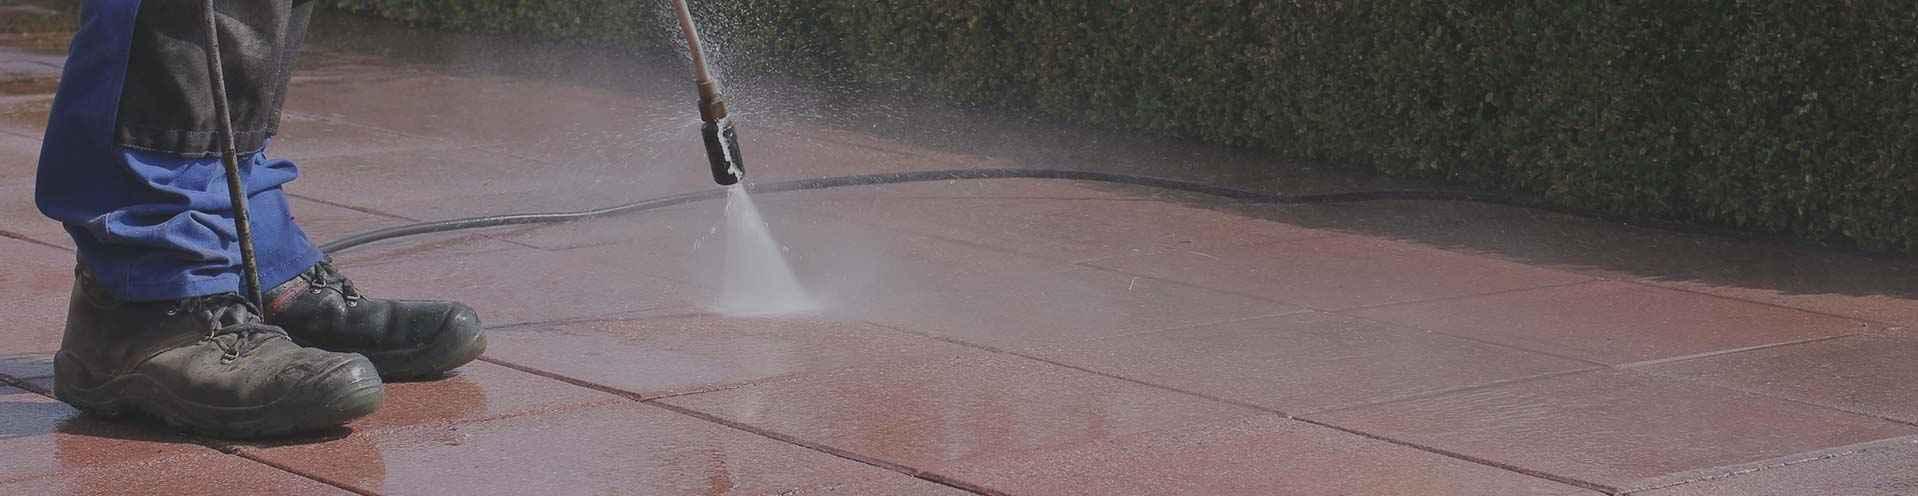 The 10 Best High Pressure Cleaners in Hobart, TAS - Oneflare